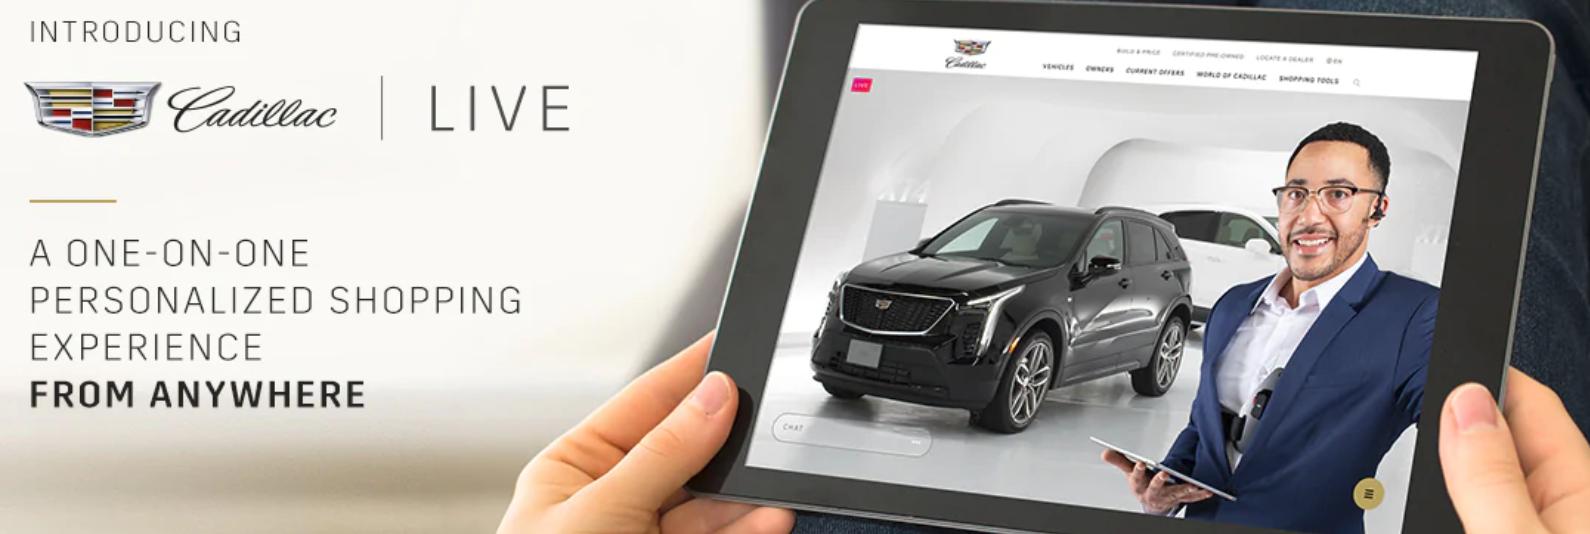 Photo: Cadillac website